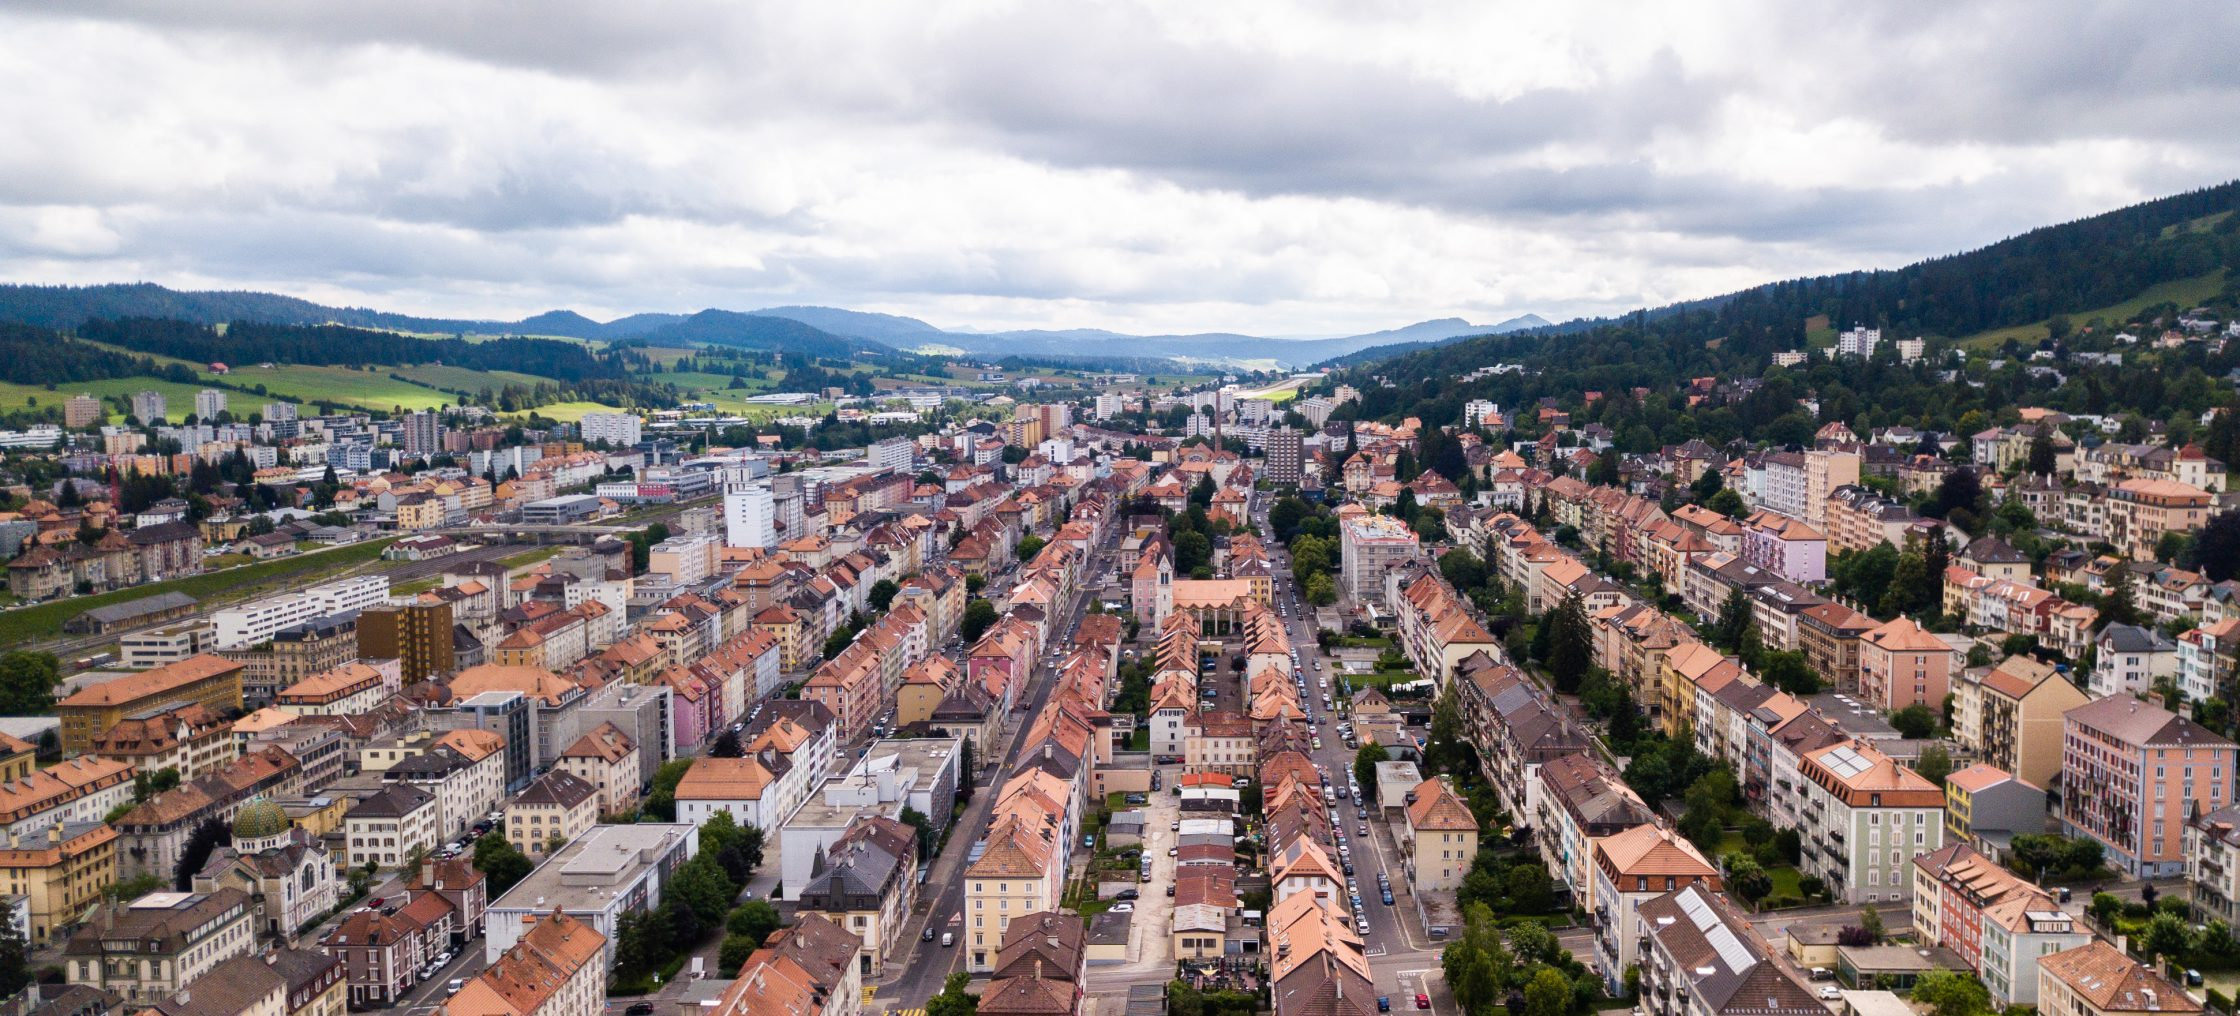 Ausblick auf la chaux-de-fonds bewölkter Himmel - kanton jura